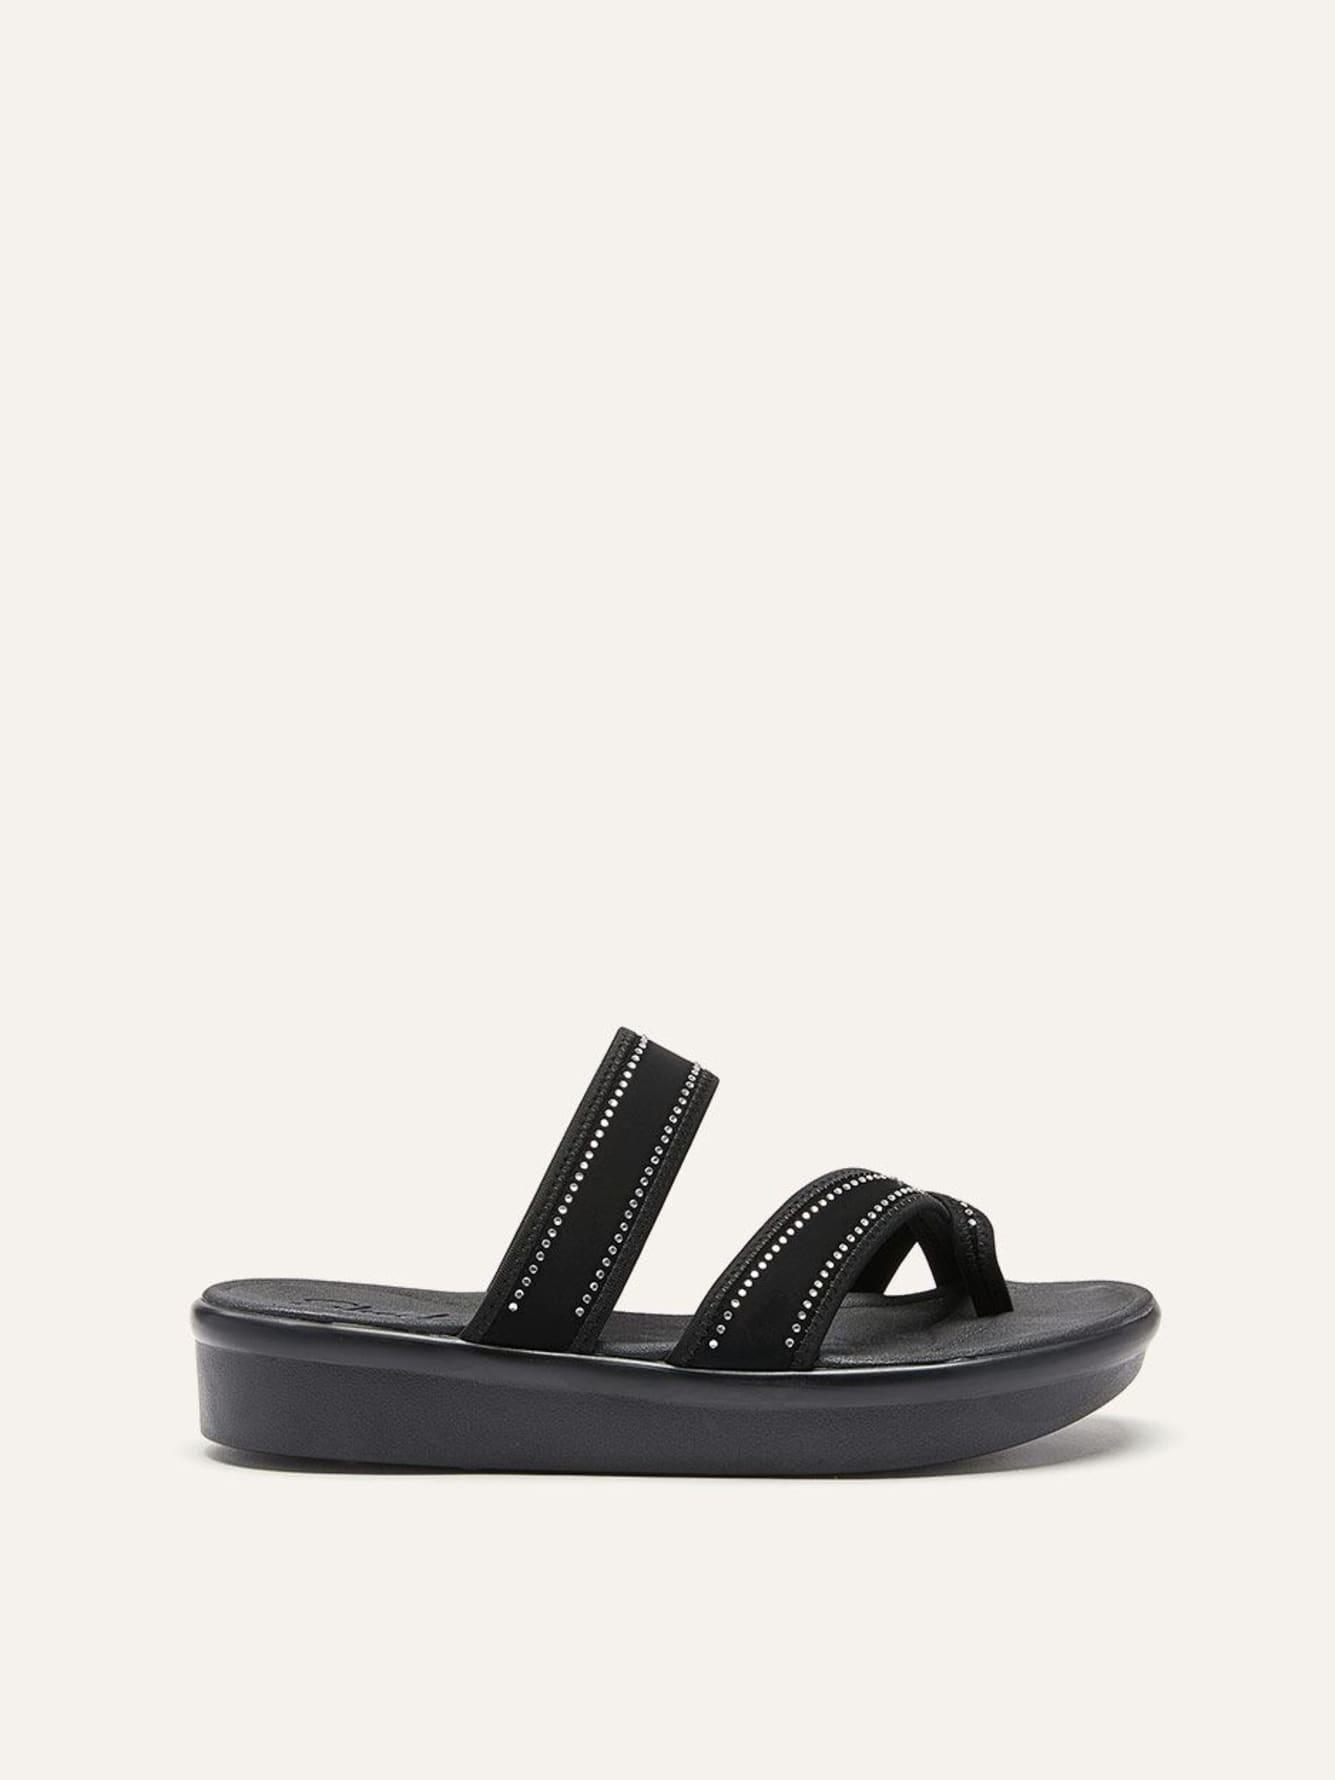 5de087bb7cbf7b Skechers - Rhinestone Slide Sandals